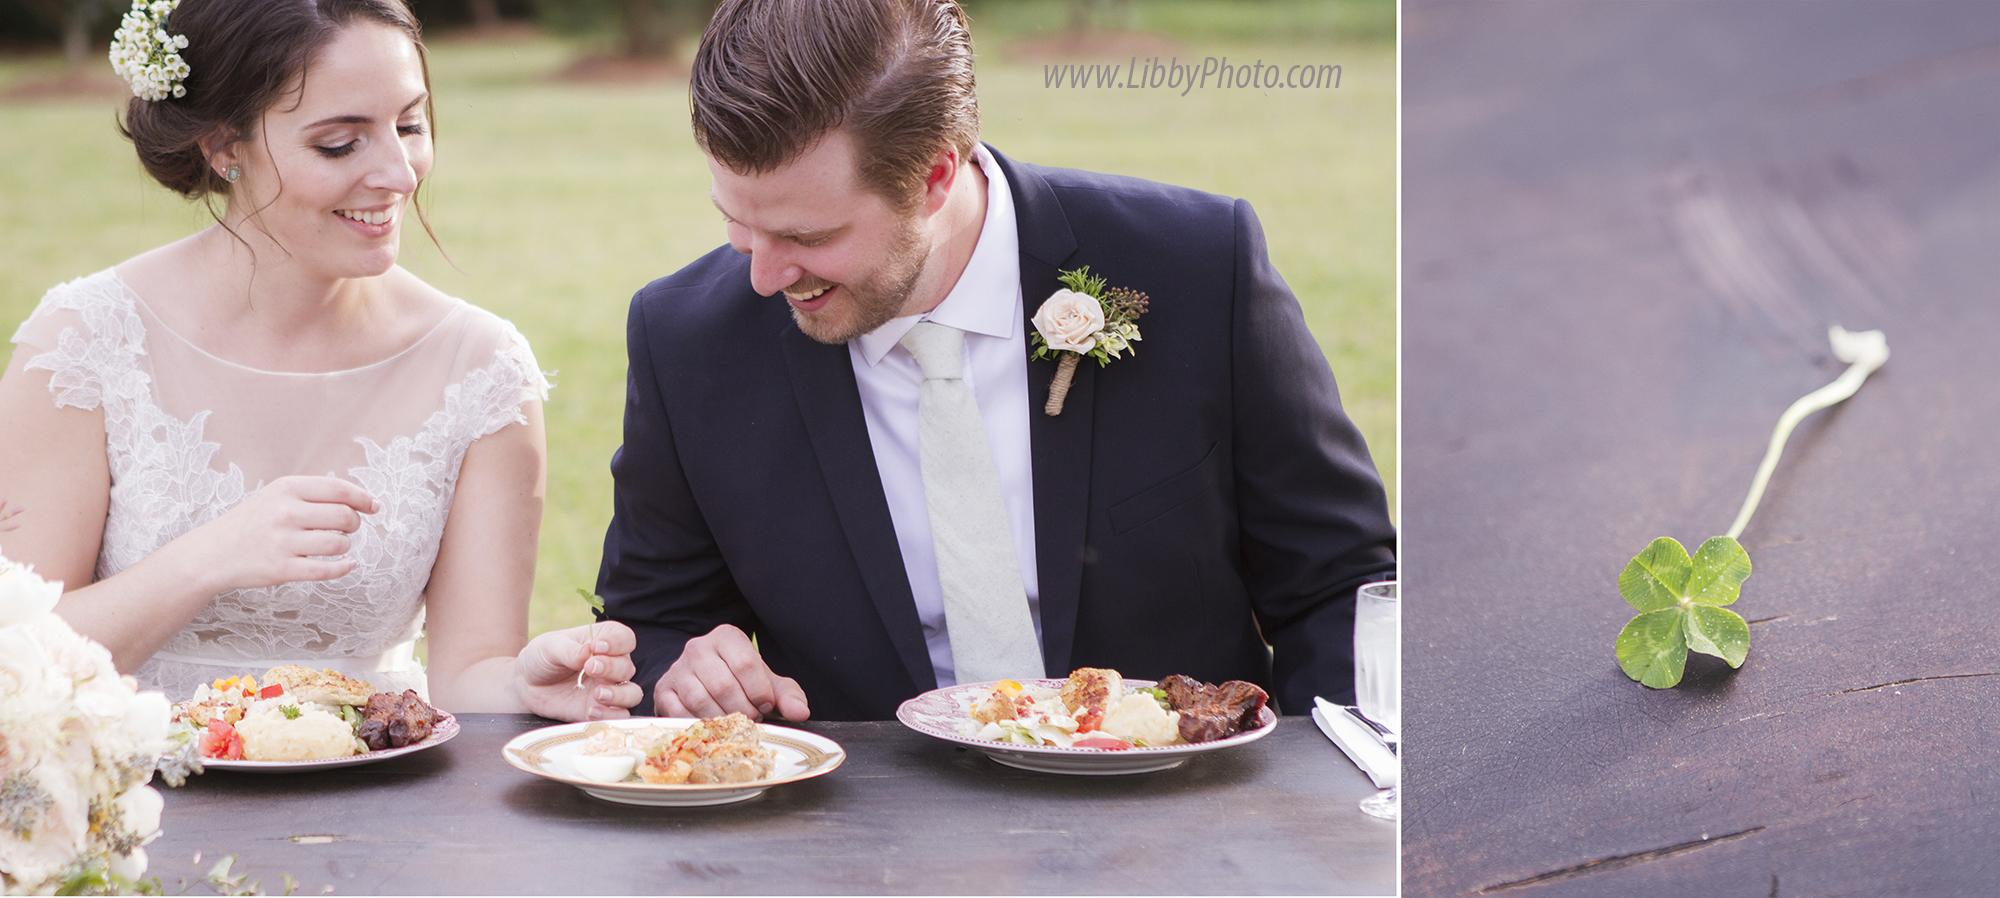 Atlanta wedding photography Libbyphoto (52).jpg